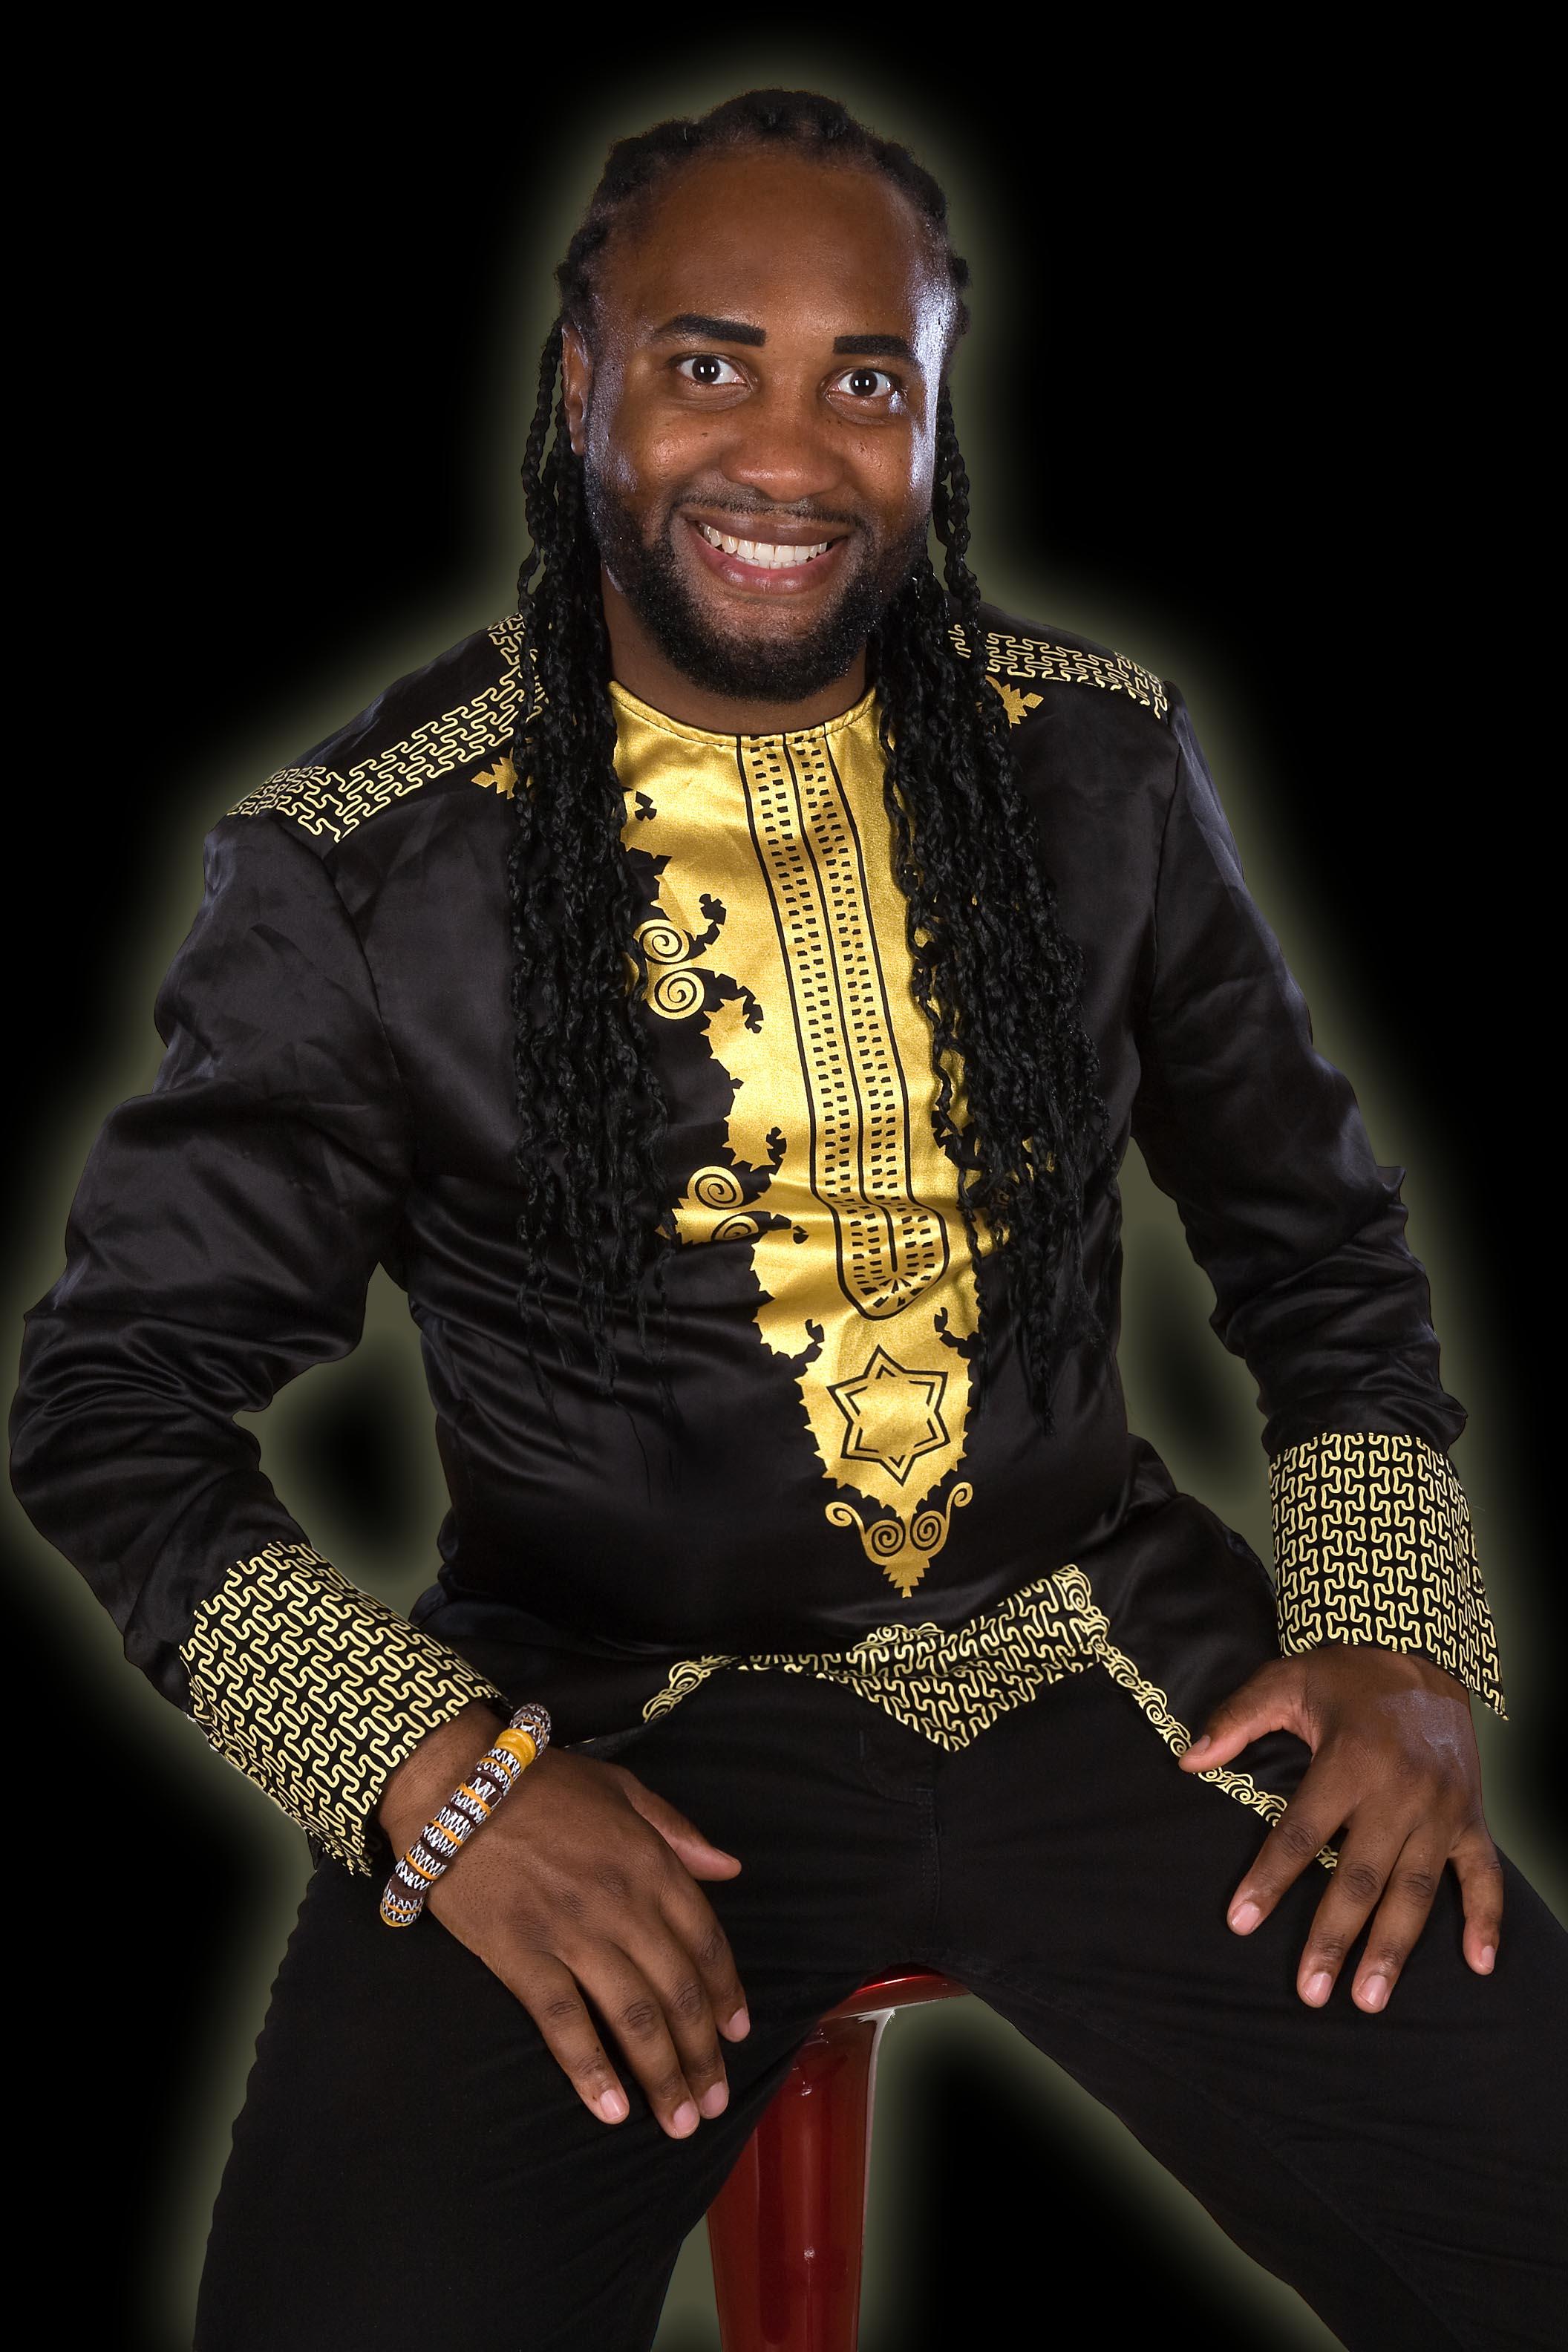 Michael Prince Johnson